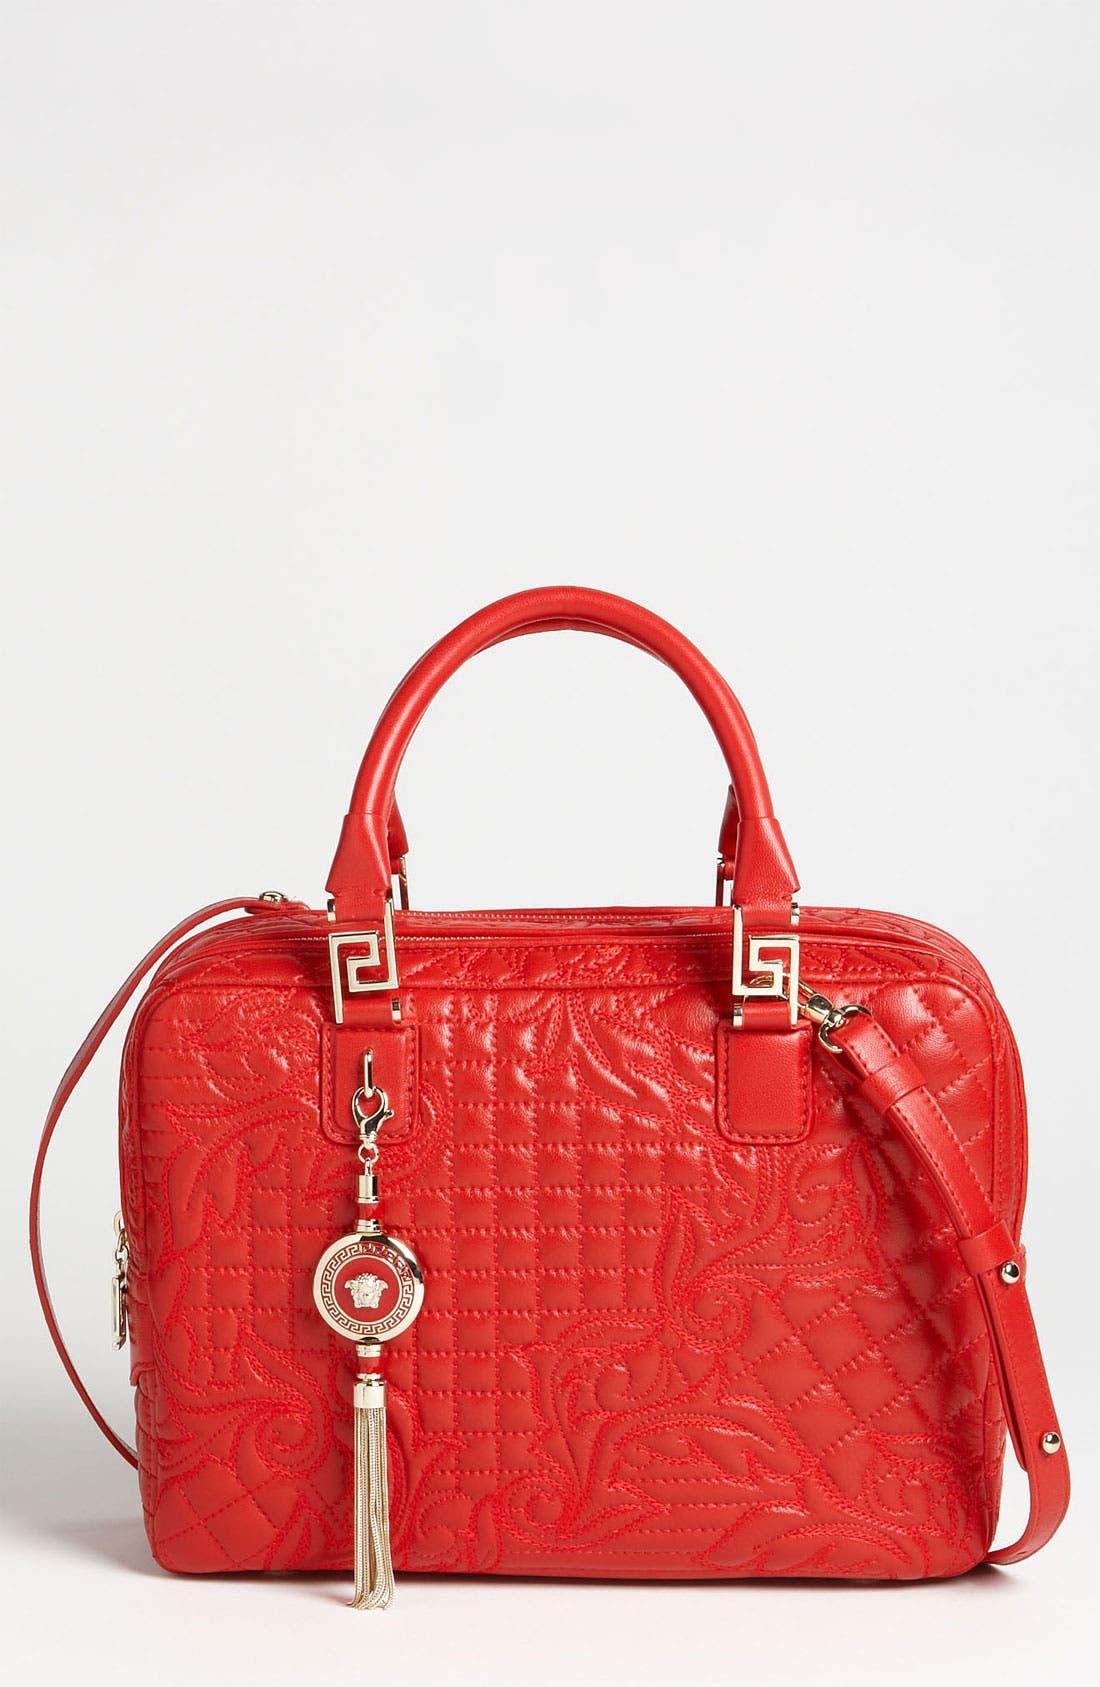 Alternate Image 1 Selected - Versace 'Linea' Leather Satchel